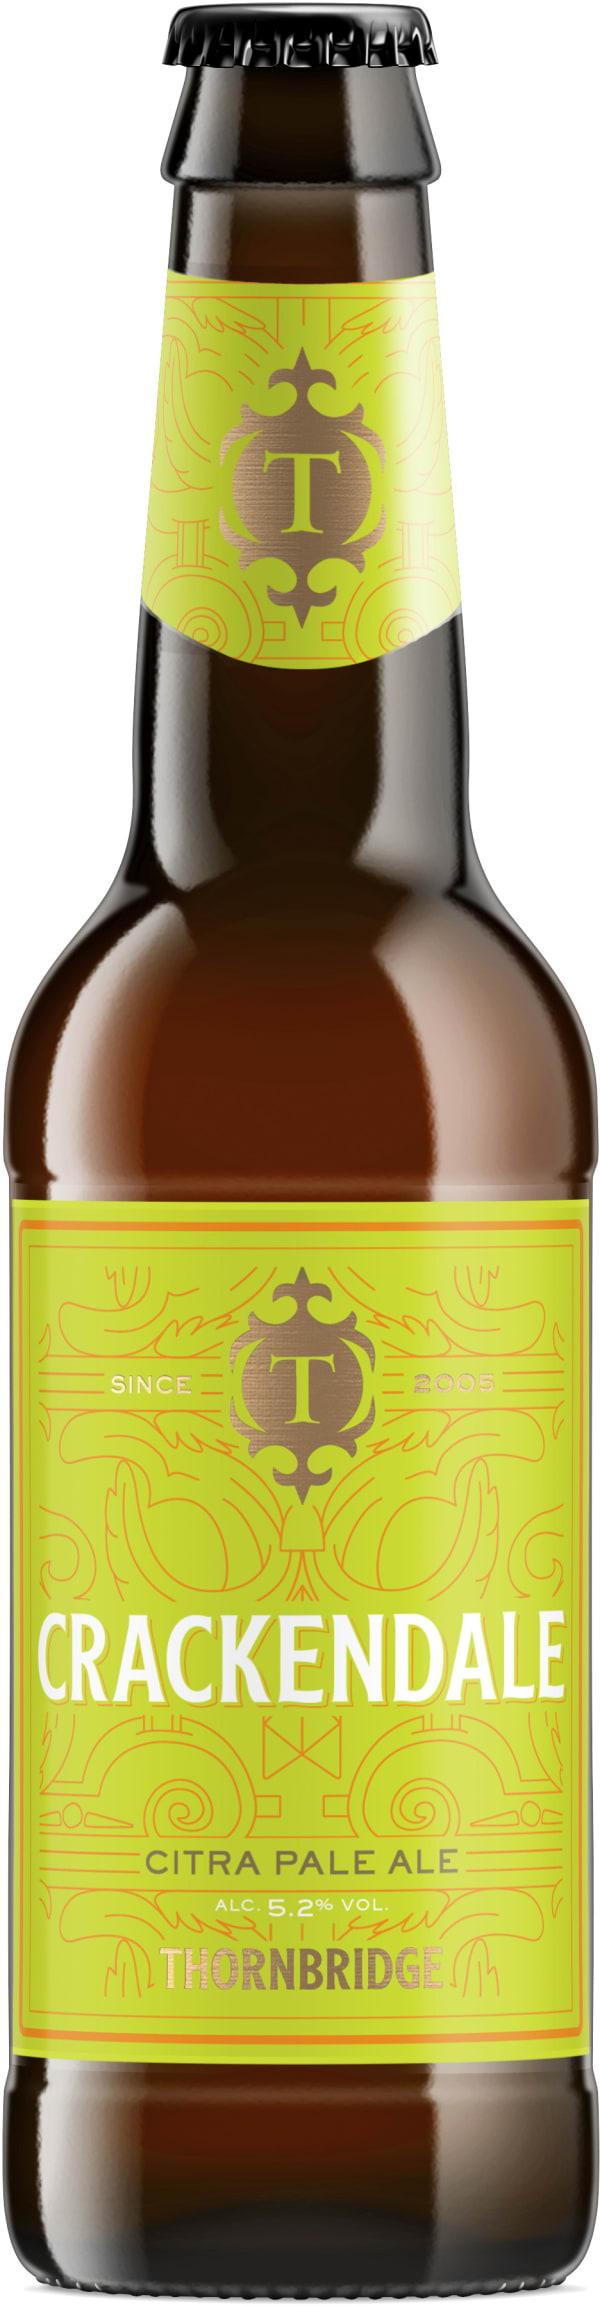 Thornbridge Crackendale Citra Pale Ale